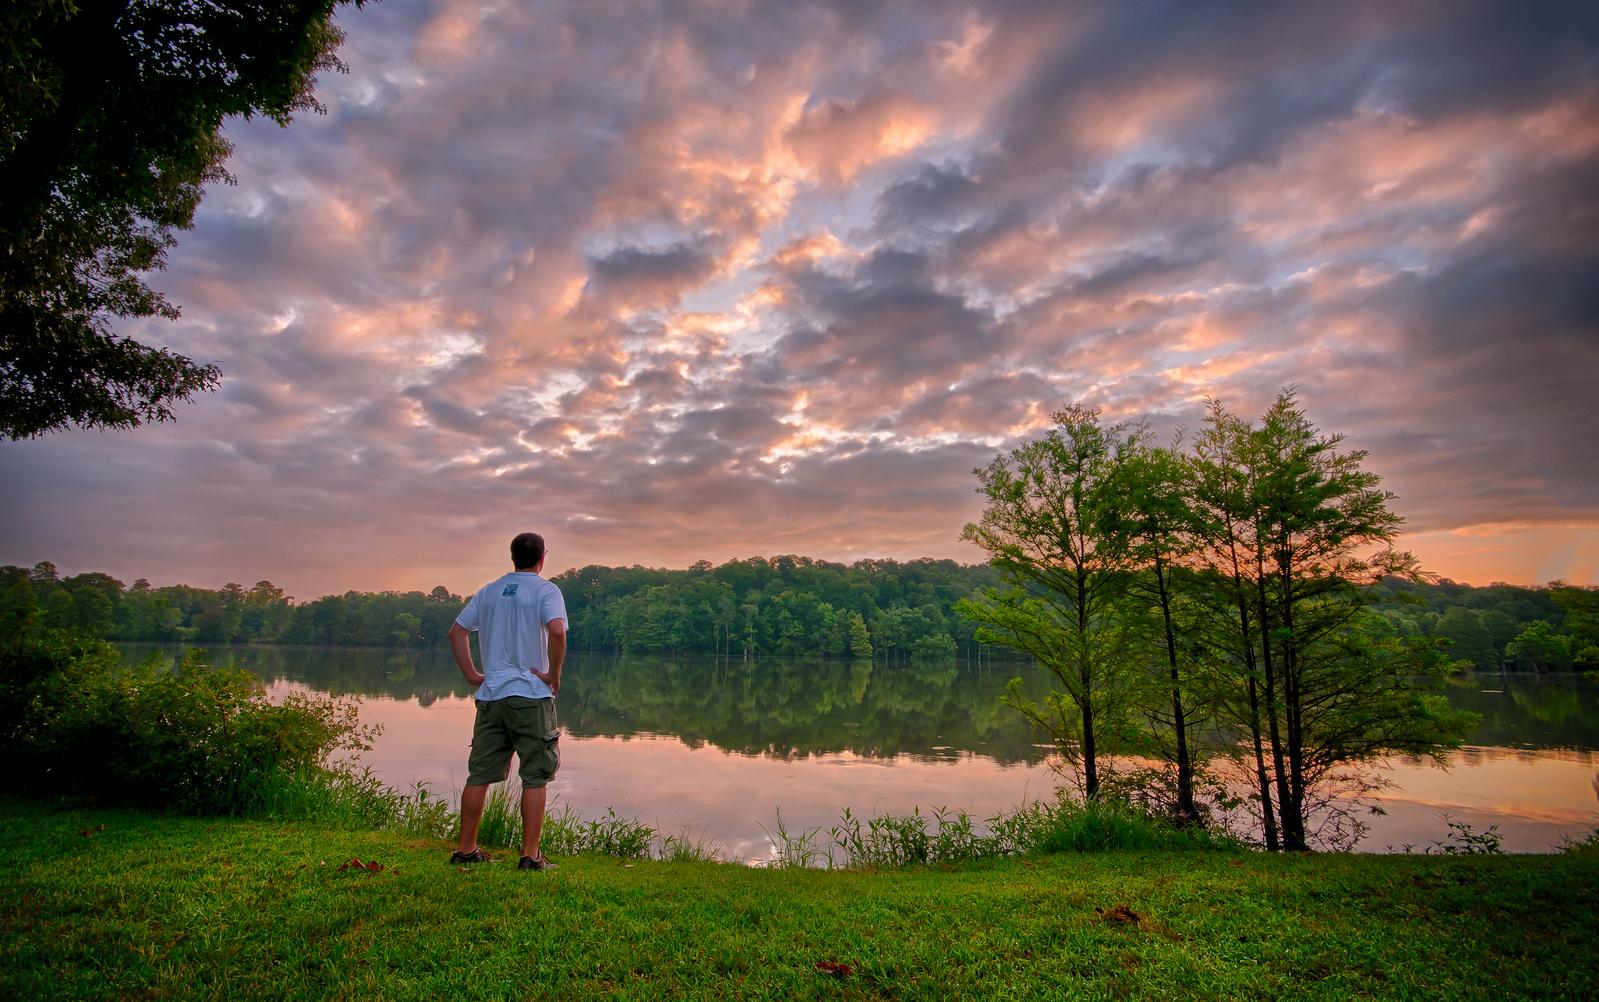 Watching the sunrise - July 12